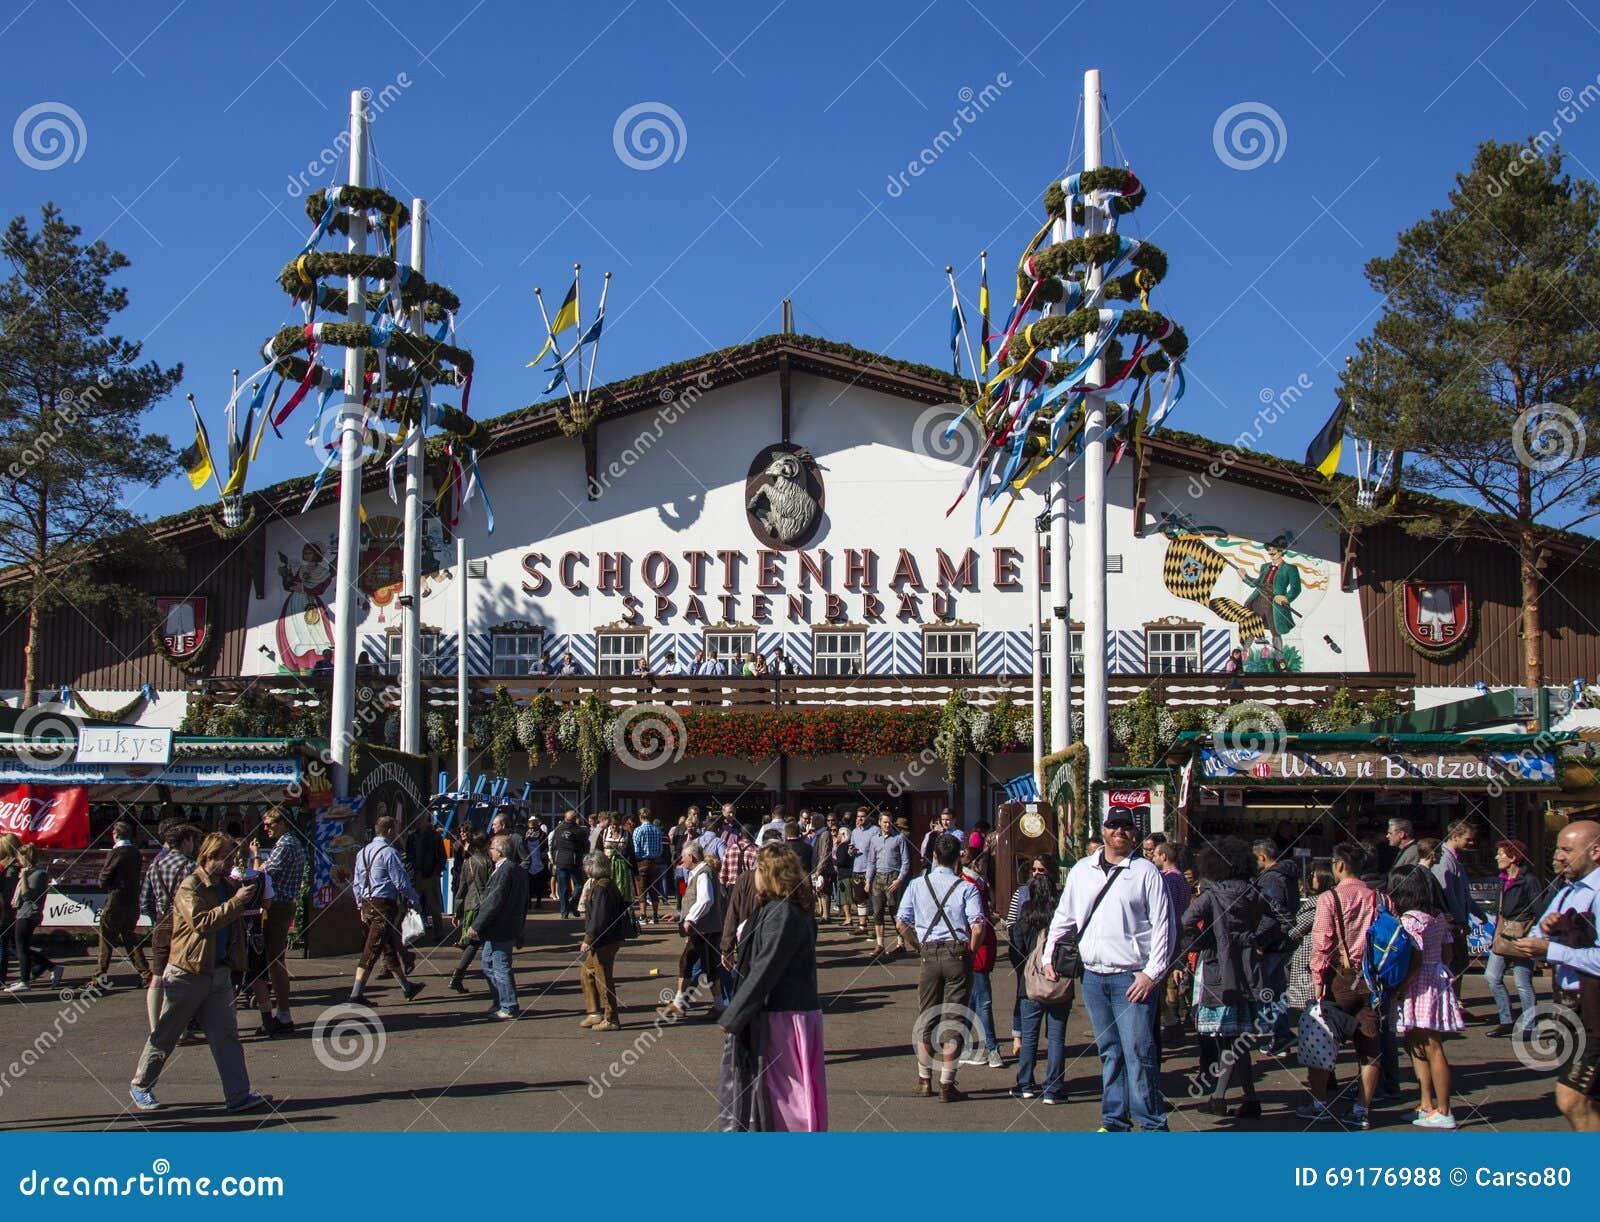 Schottenhamel tent at Oktoberfest in Munich Germany 2015 & Schottenhamel Tent At Oktoberfest In Munich Germany 2015 ...